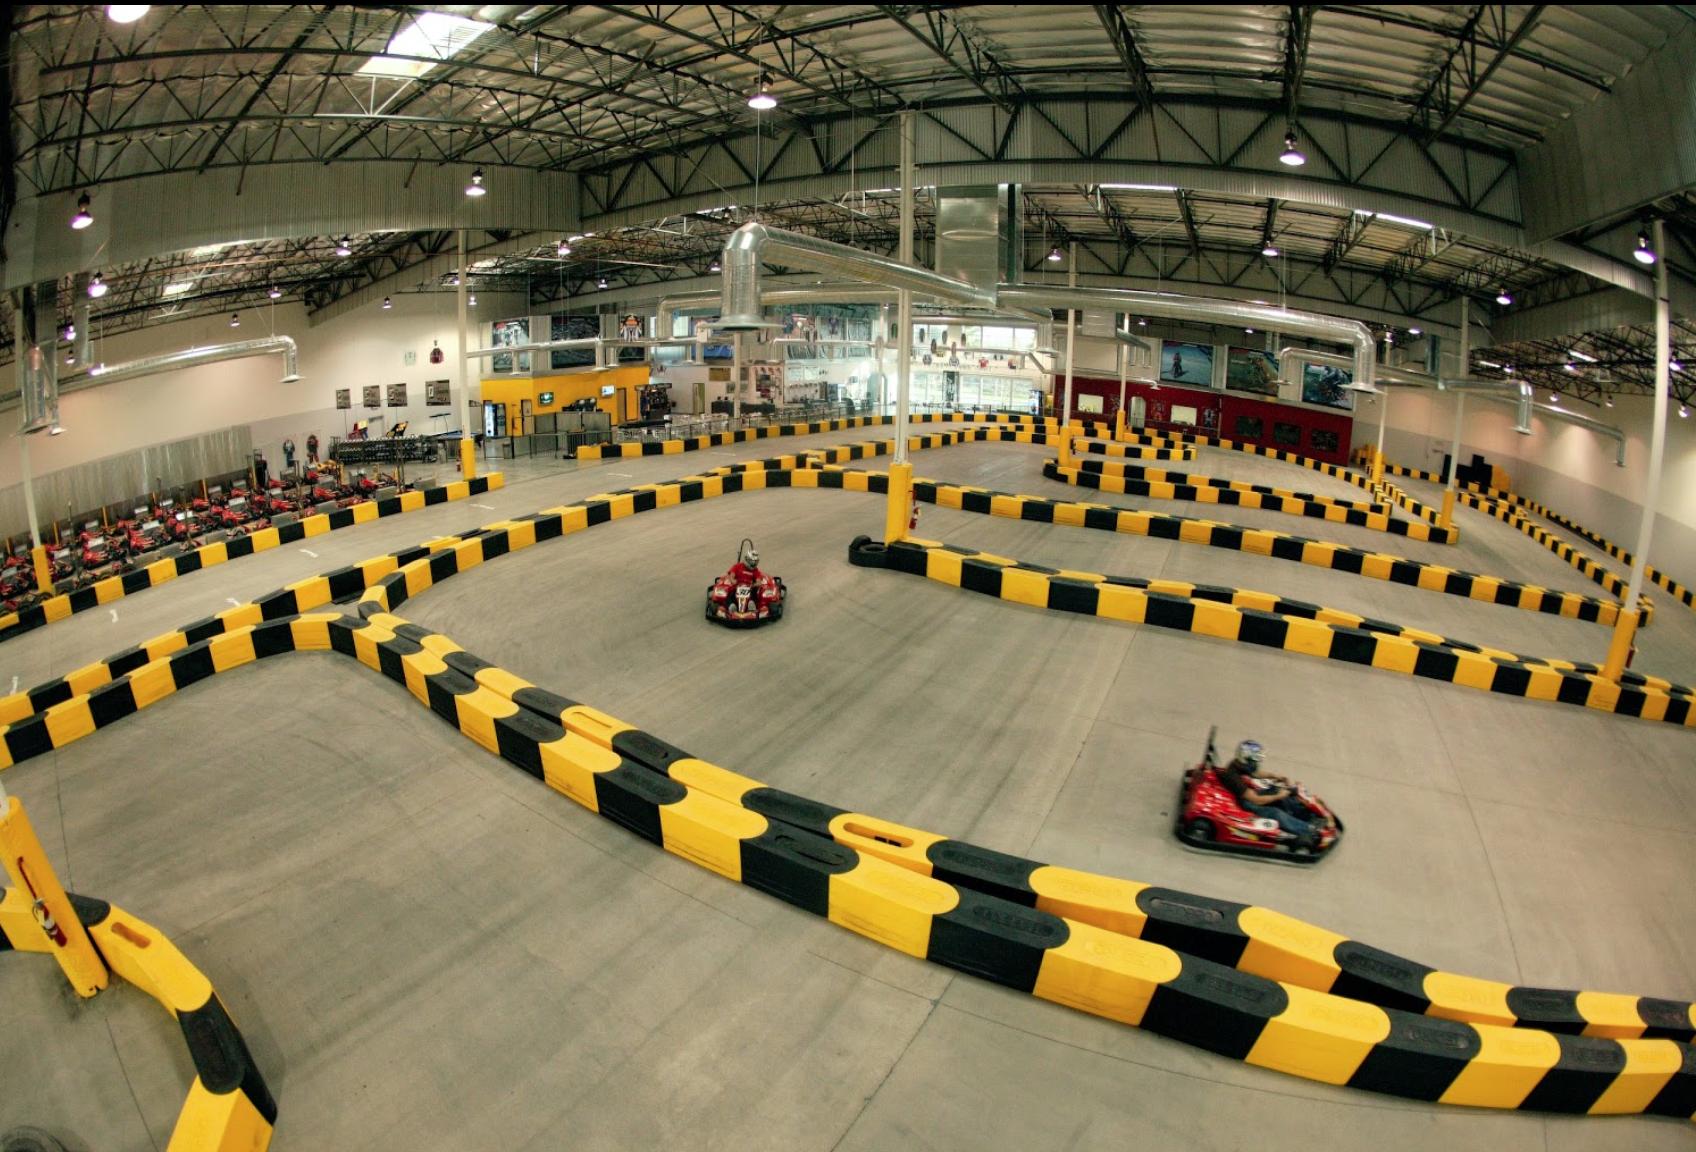 Indoor Go Karts Nashville >> Pole Position Raceway: 45 MPH Indoor Go-Karts In Southern ...